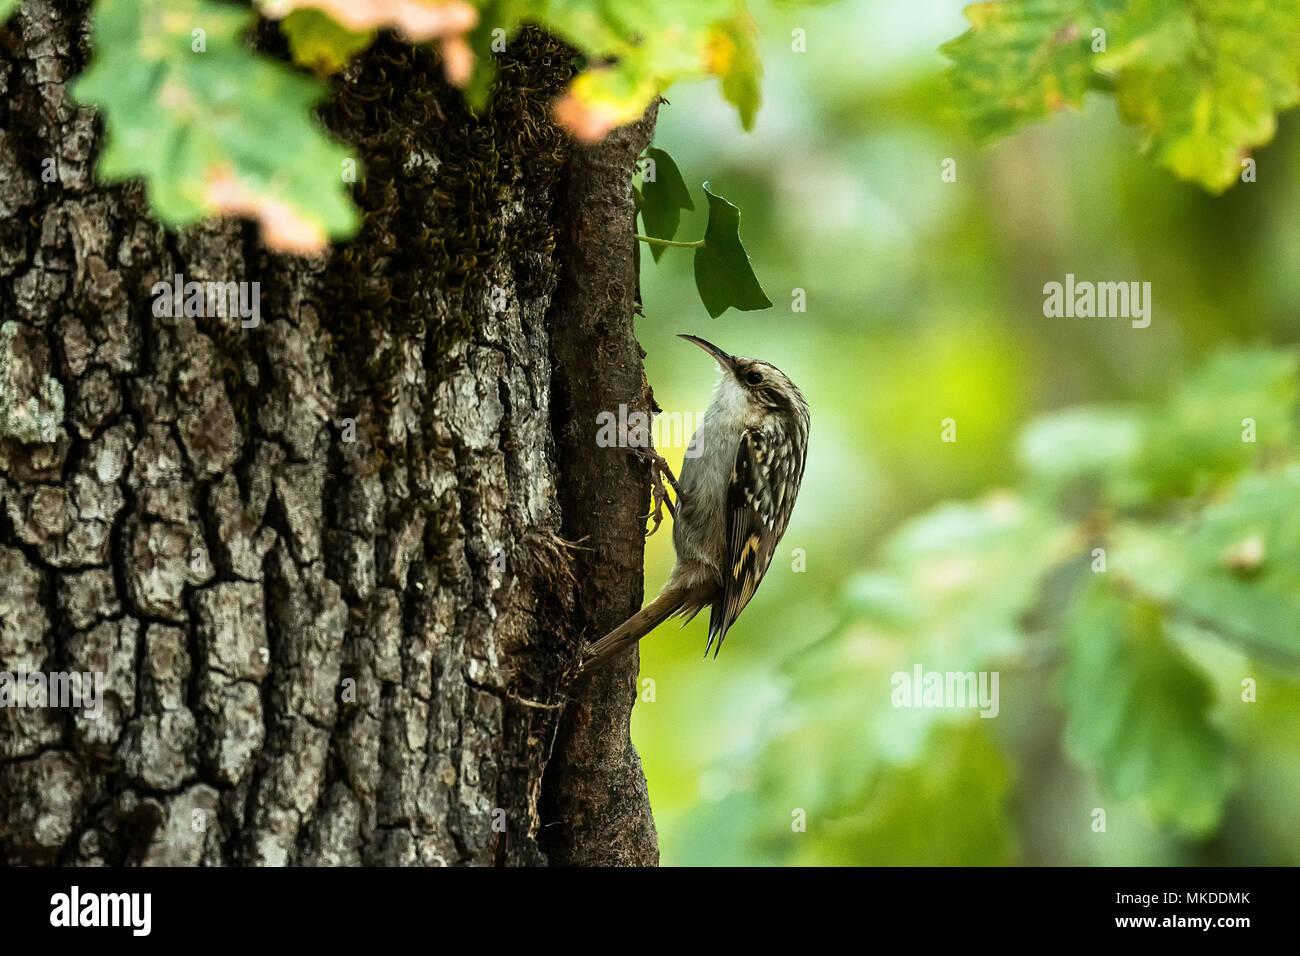 Short-Toed Treecreeper (Certhia brachydactyla), Pyrenees, Spain - Stock Image